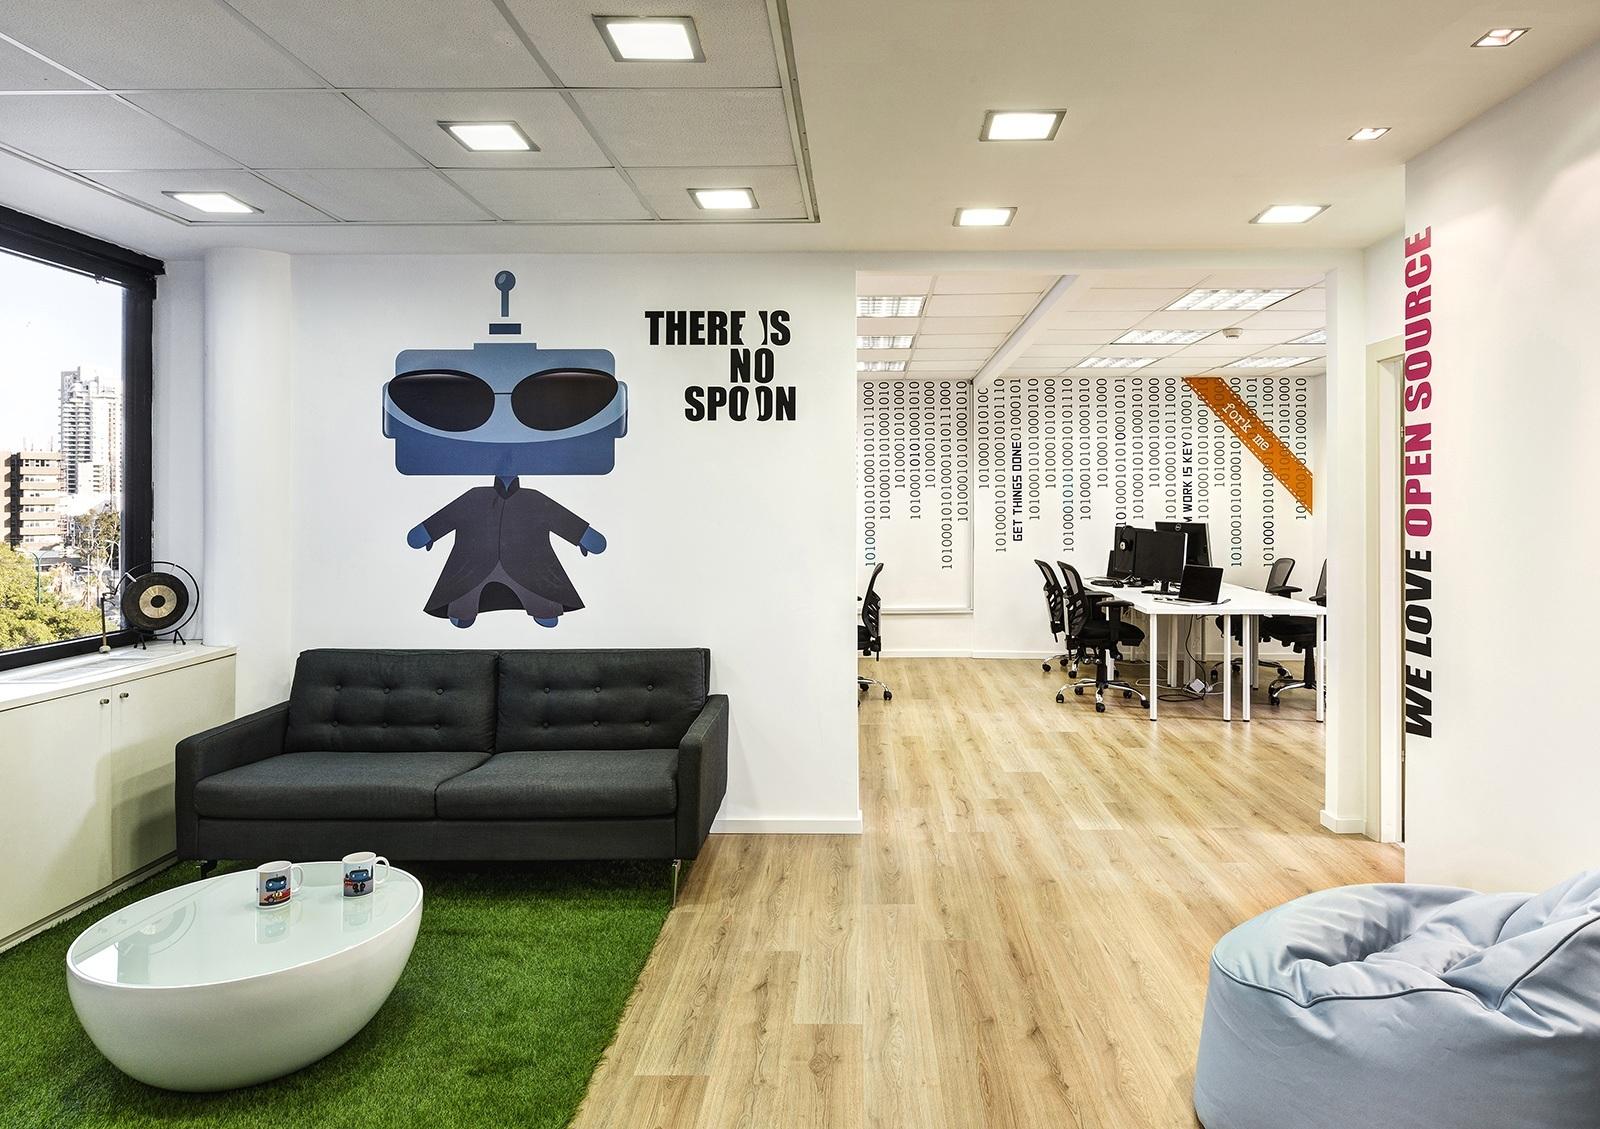 An exclusive look inside soomla s cool tel aviv headquarters officelovin 39 - Walt disney office locations ...